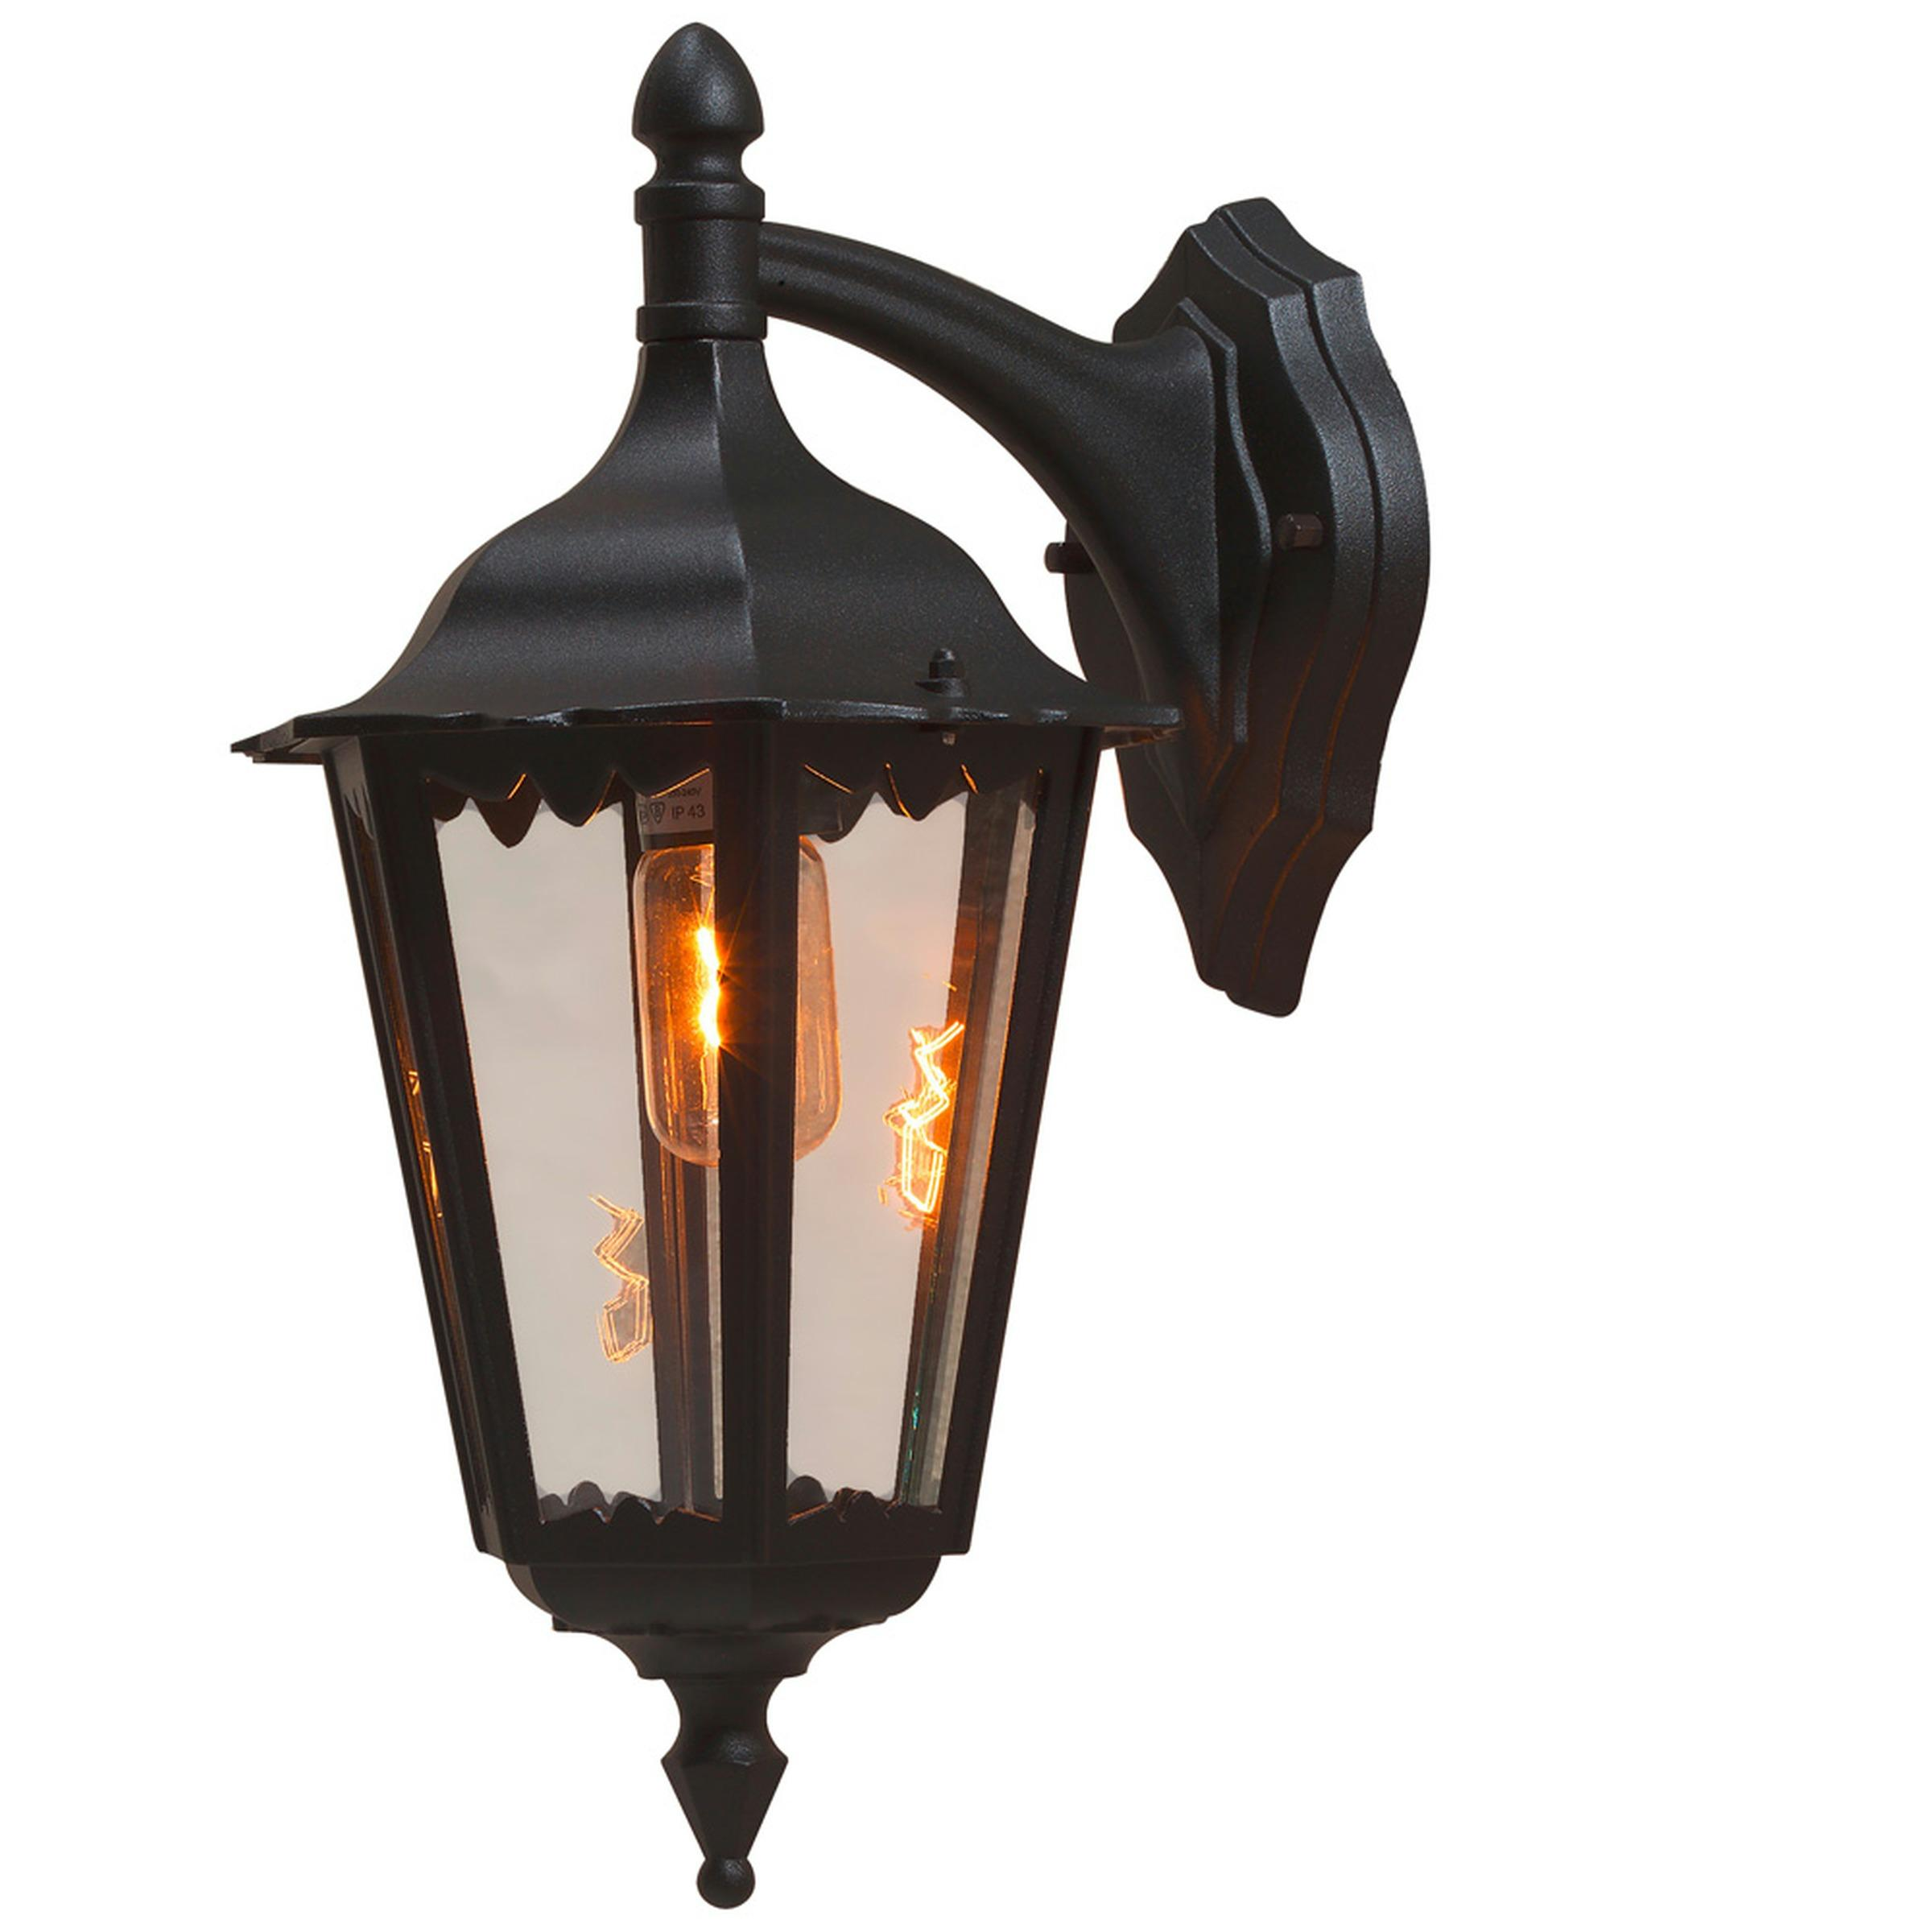 Bevallige buitenwandlamp FIRENZE B hangend, zwart